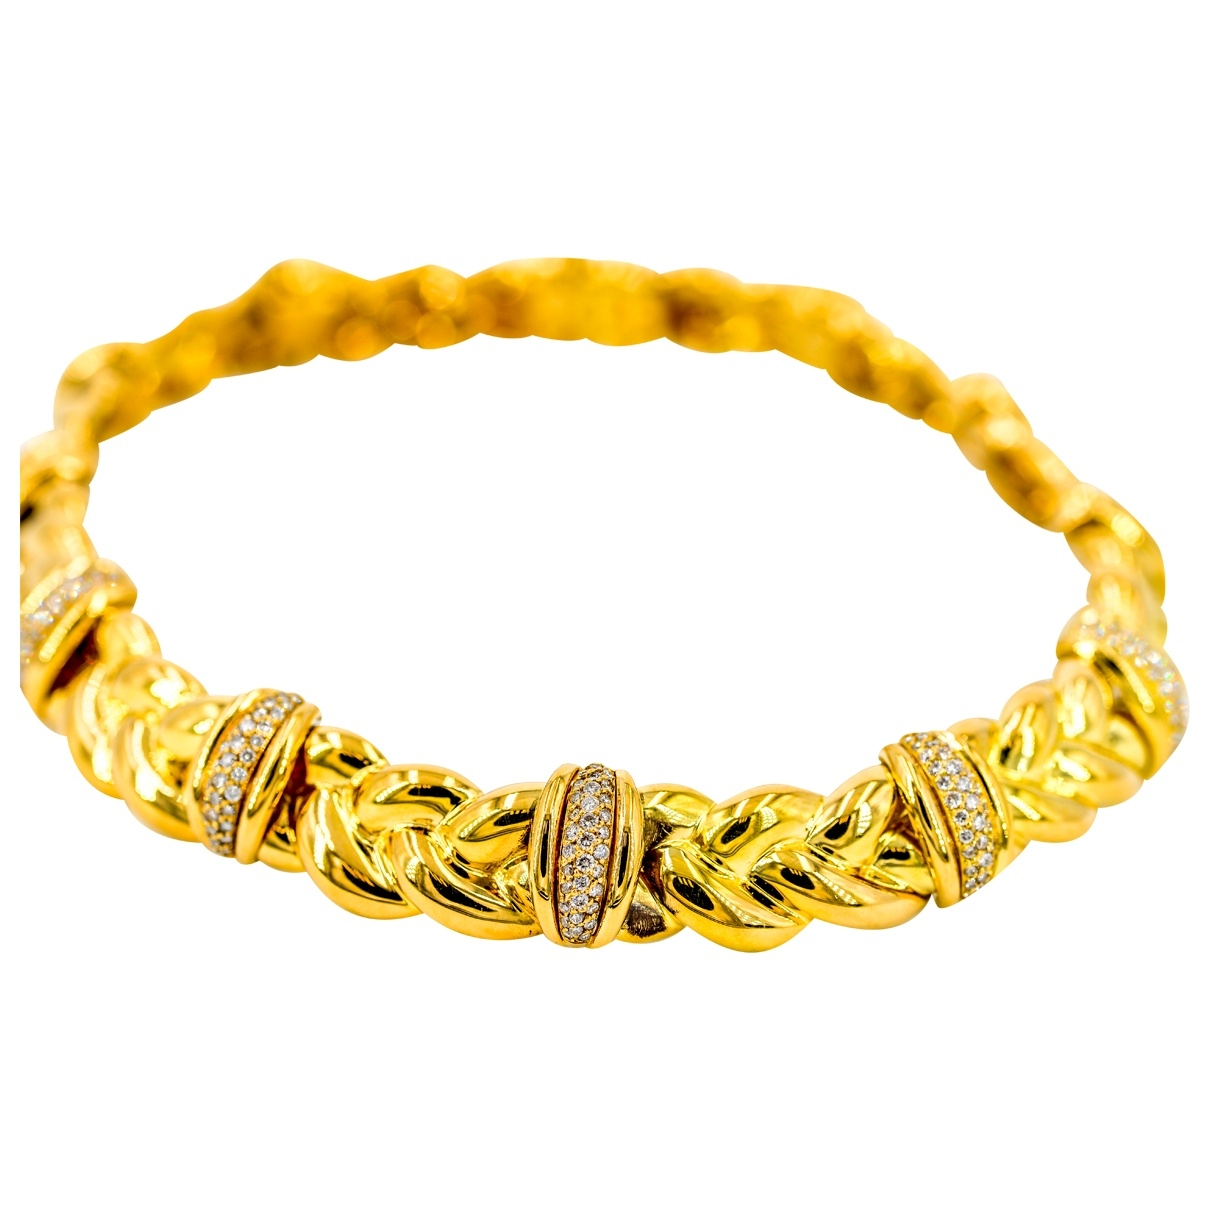 Collar de Oro amarillo O.j. Perrin